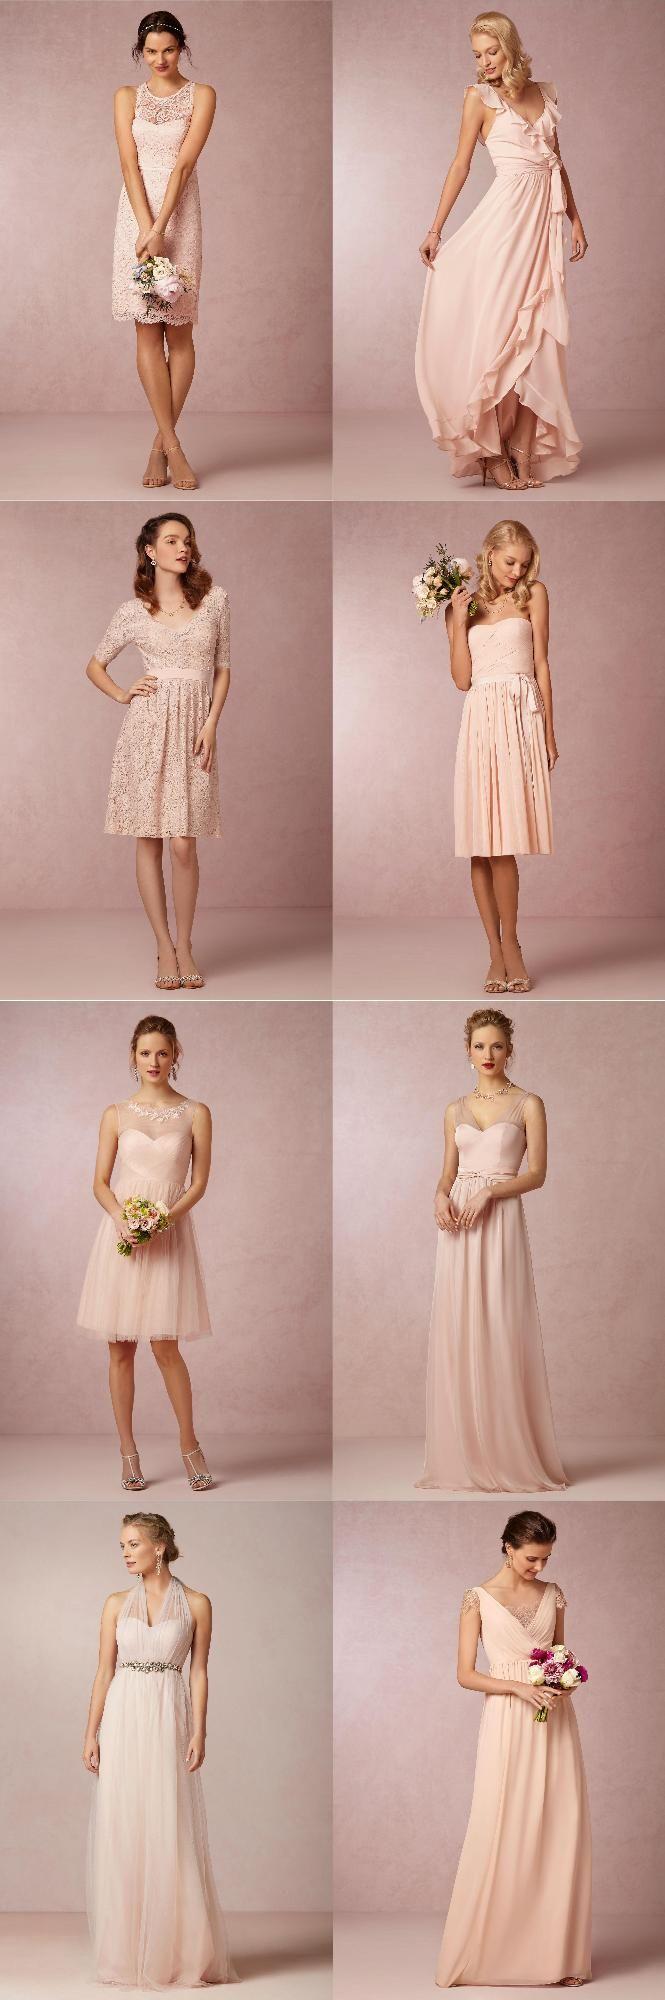 Wedding Trend: Blush Bridesmaid Dresses | Damas, Diferentes estilos ...